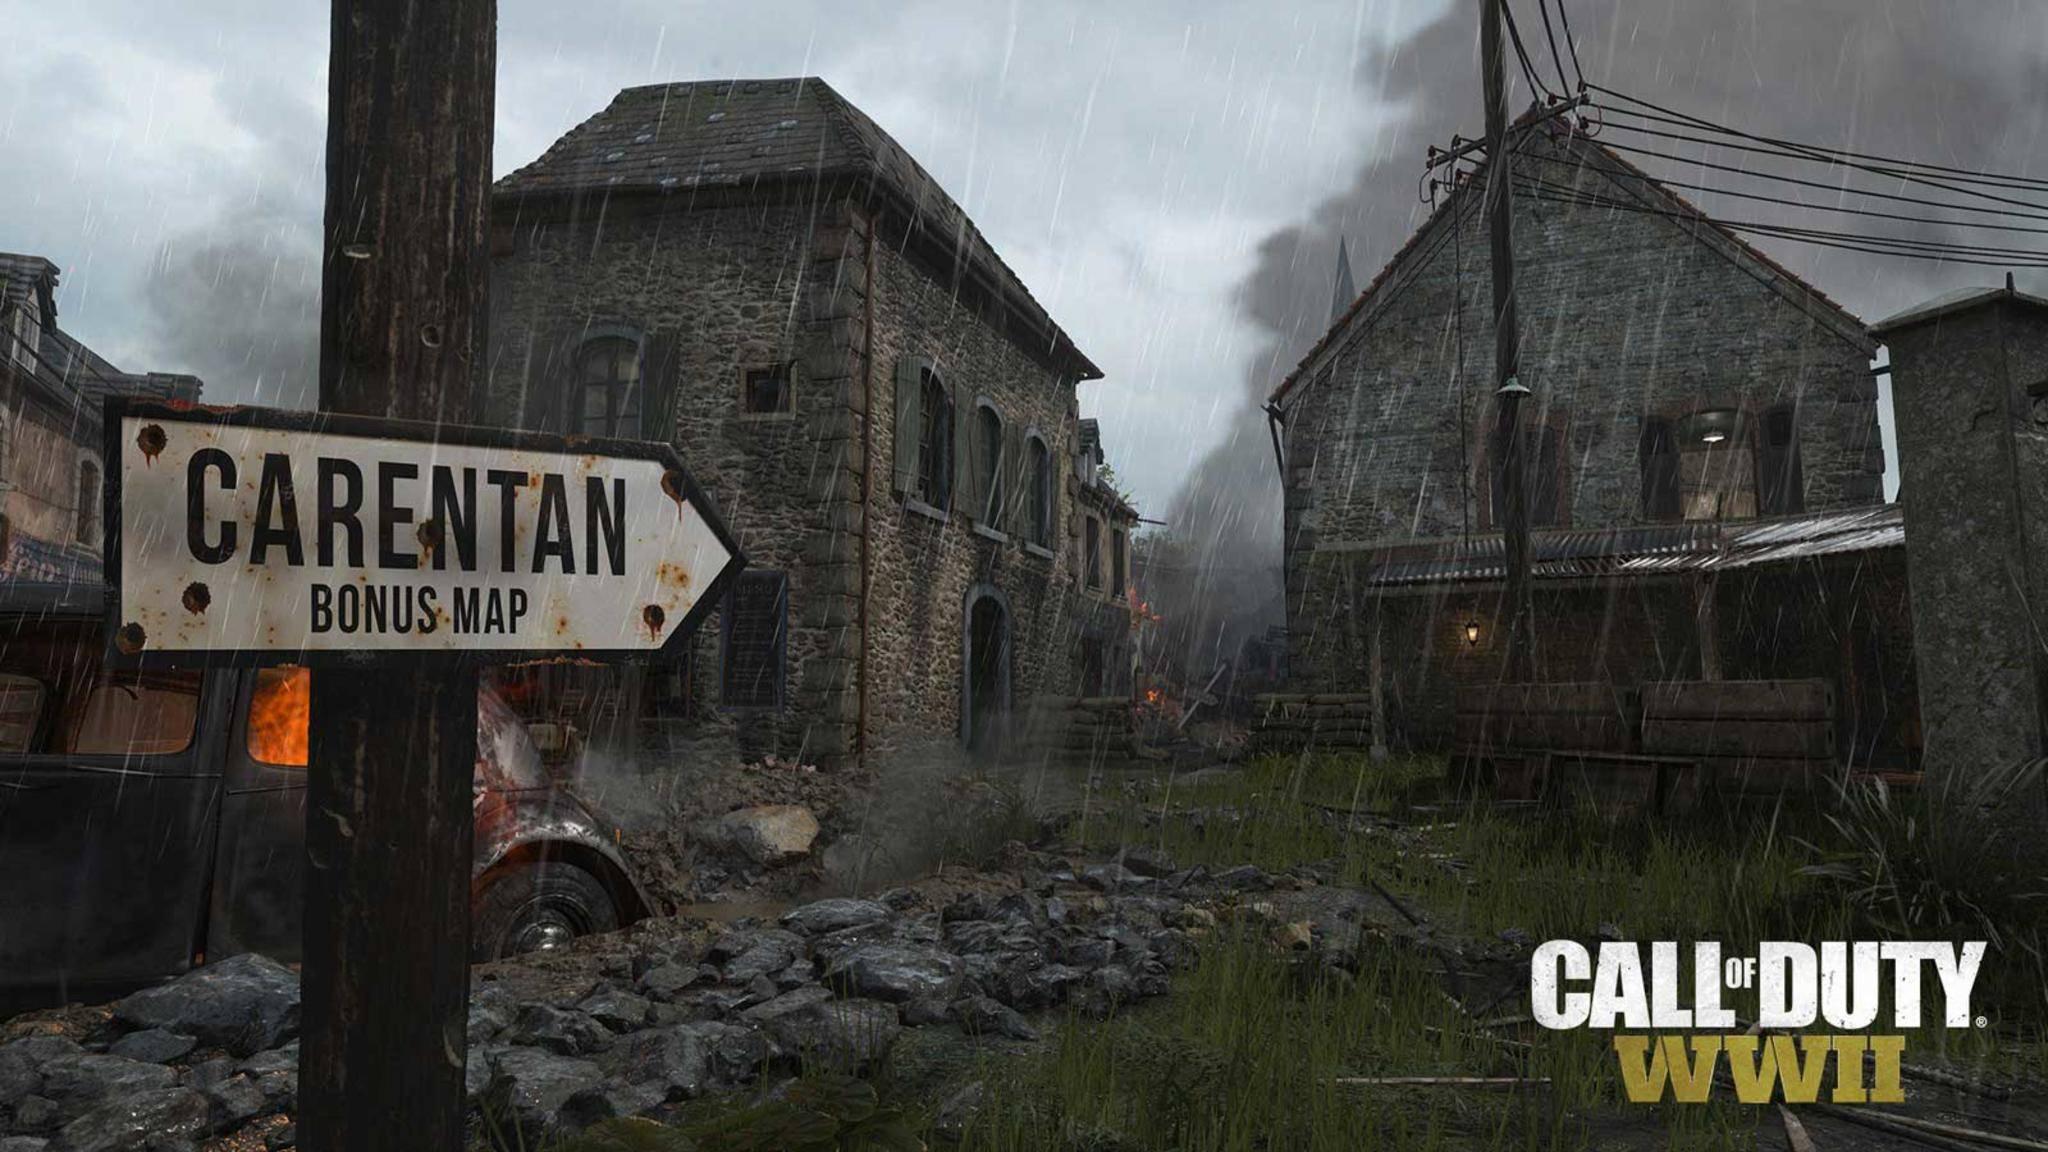 Call of Duty: WW2 - Carentan